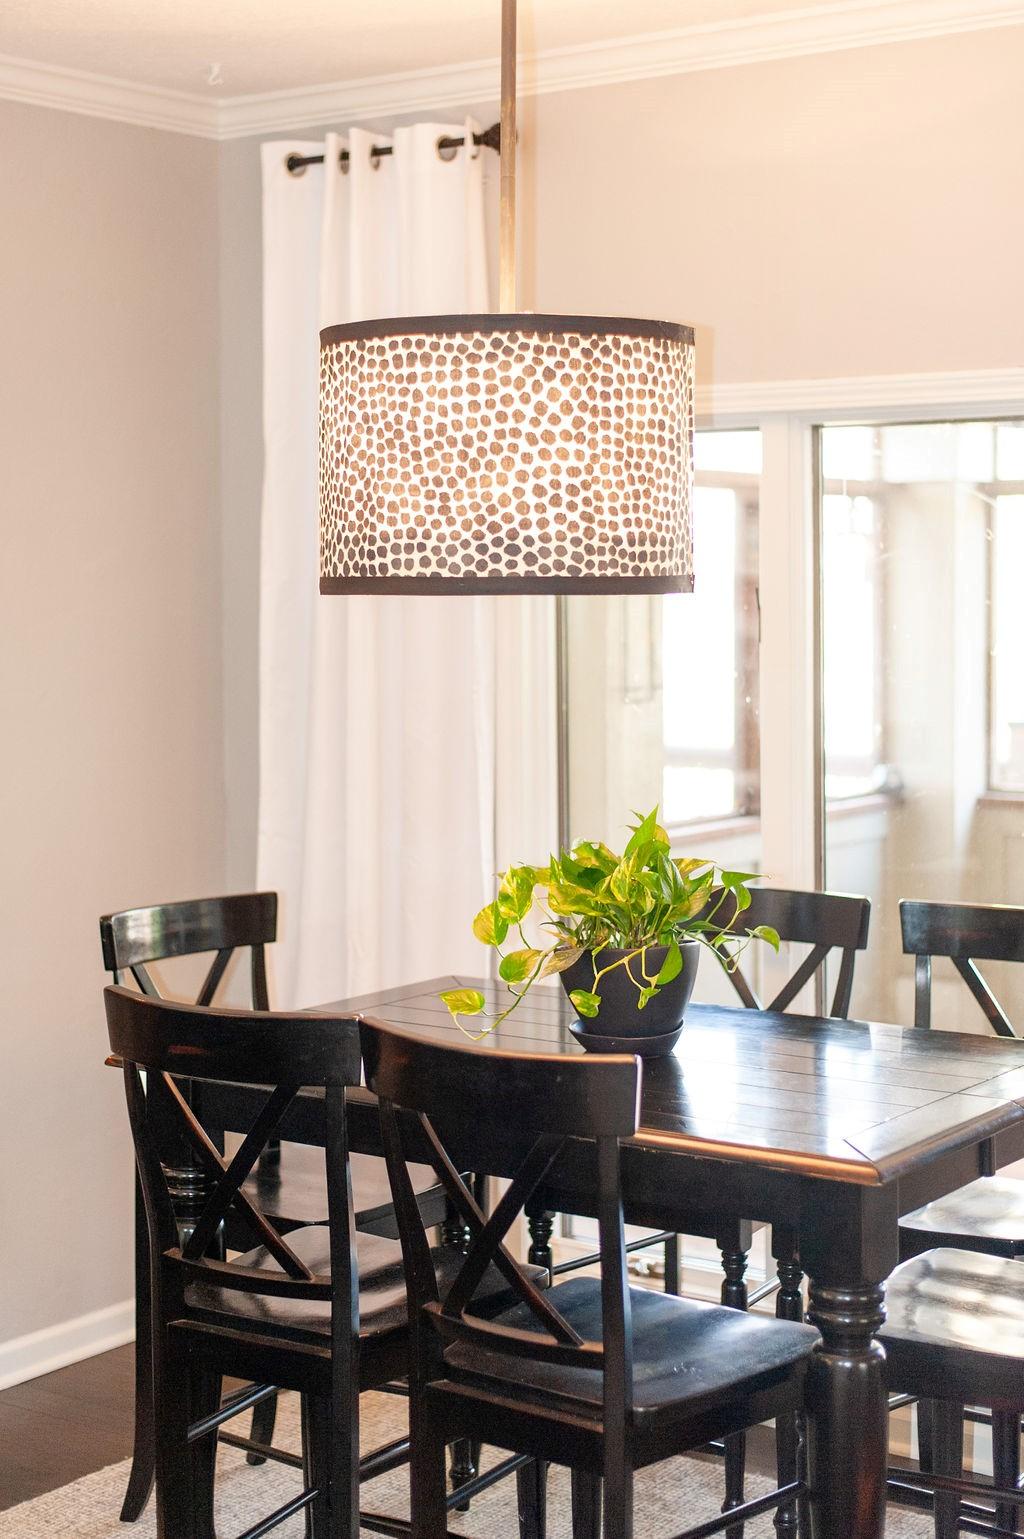 Blank-Canvas-Interior-Design-in-kansas-city-Kitchen-Table.jpg